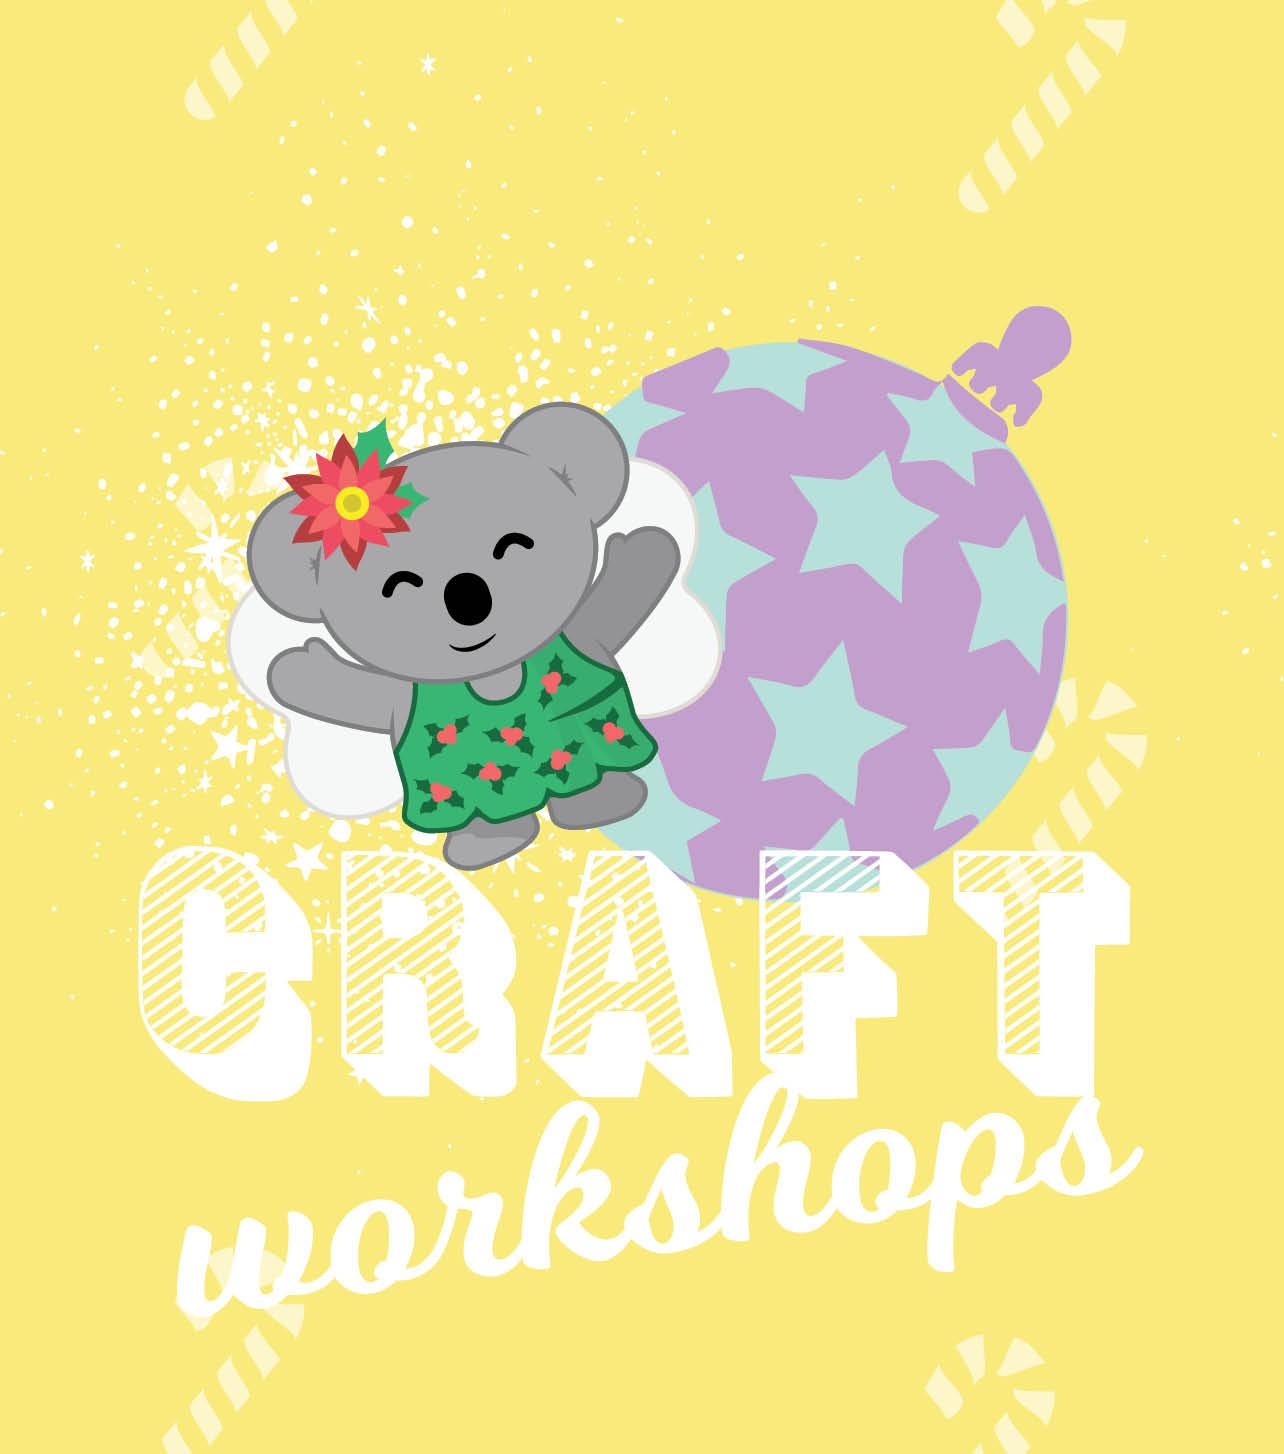 CH4806_Xmas 2019_Web Tiles_Craft Workshop_624x727px